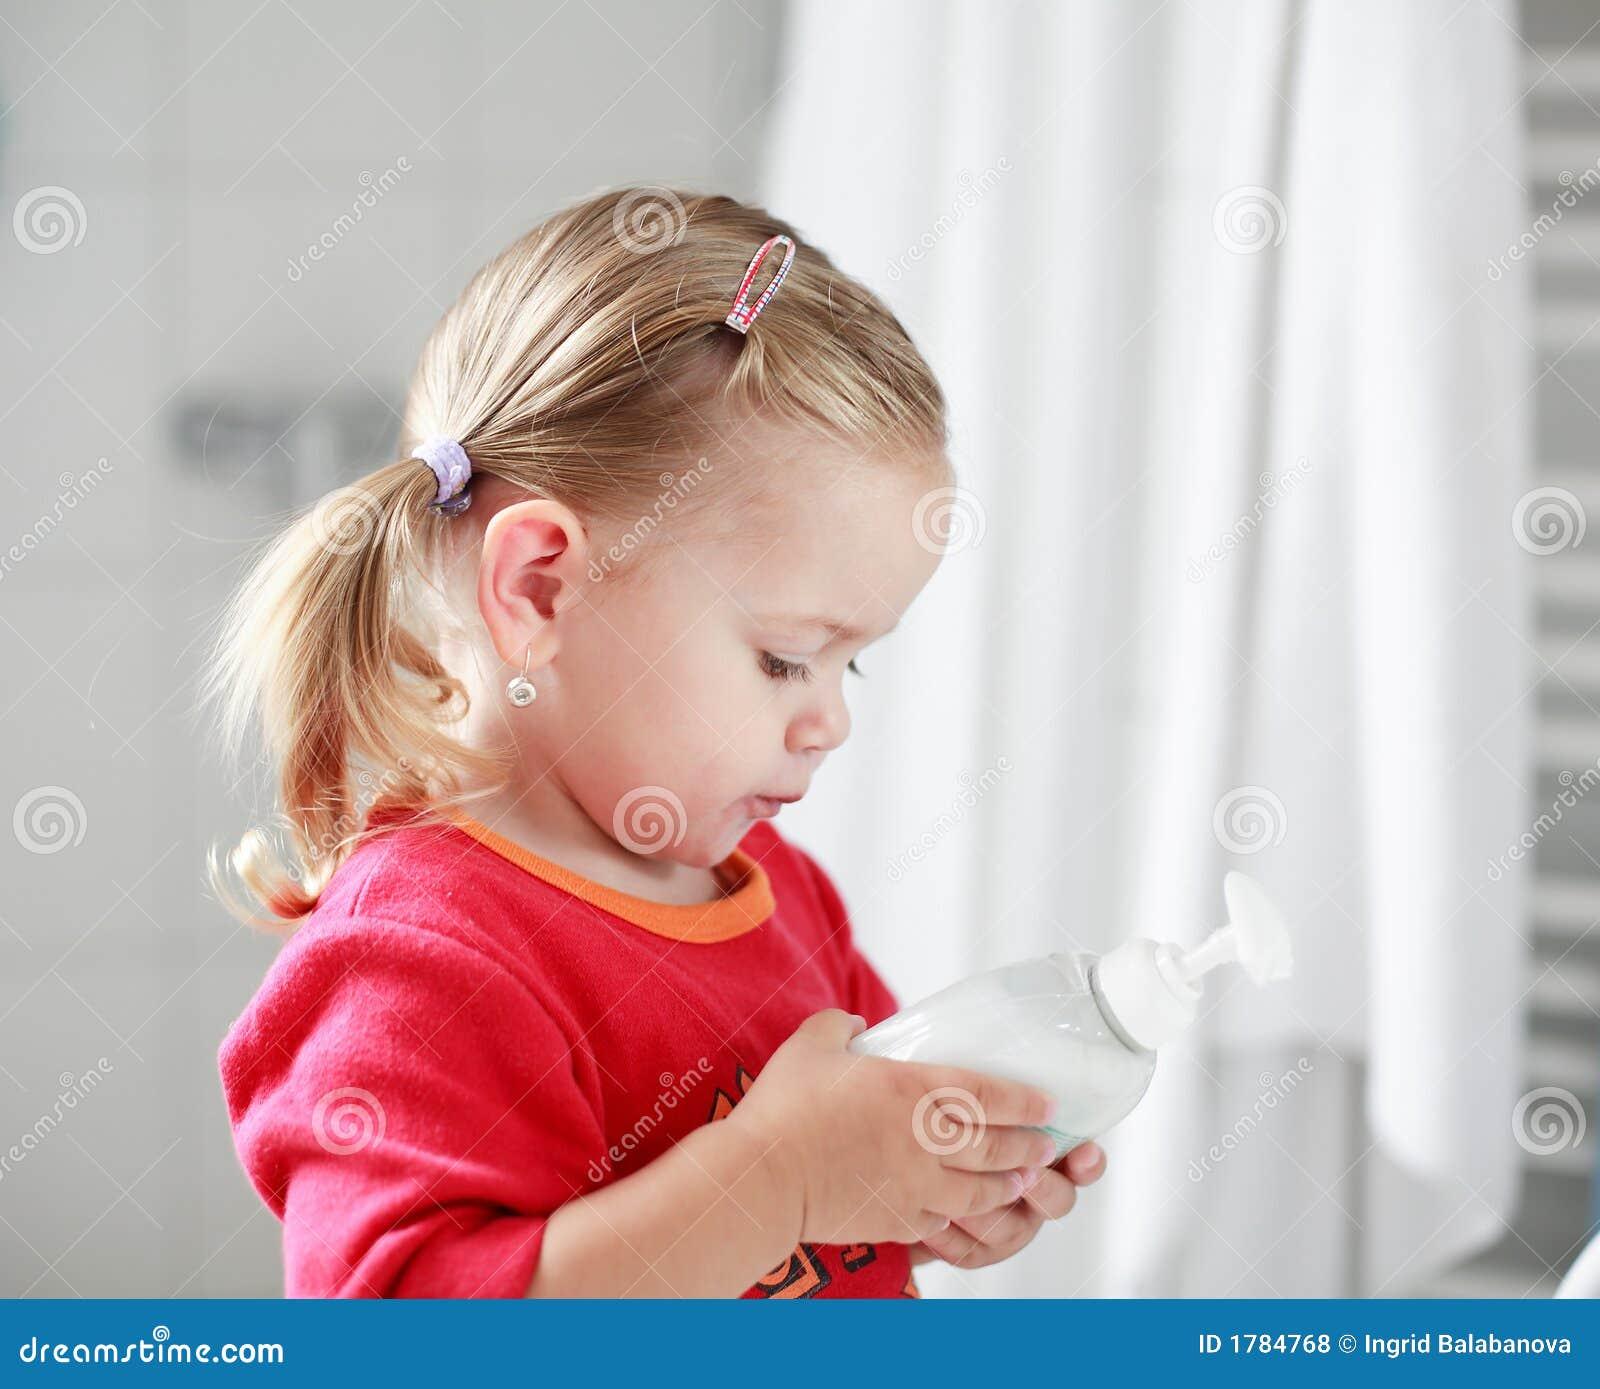 Klein meisje dat haar handen wast royalty vrije stock foto 39 s afbeelding 1784768 - Kleurenkamer klein meisje ...